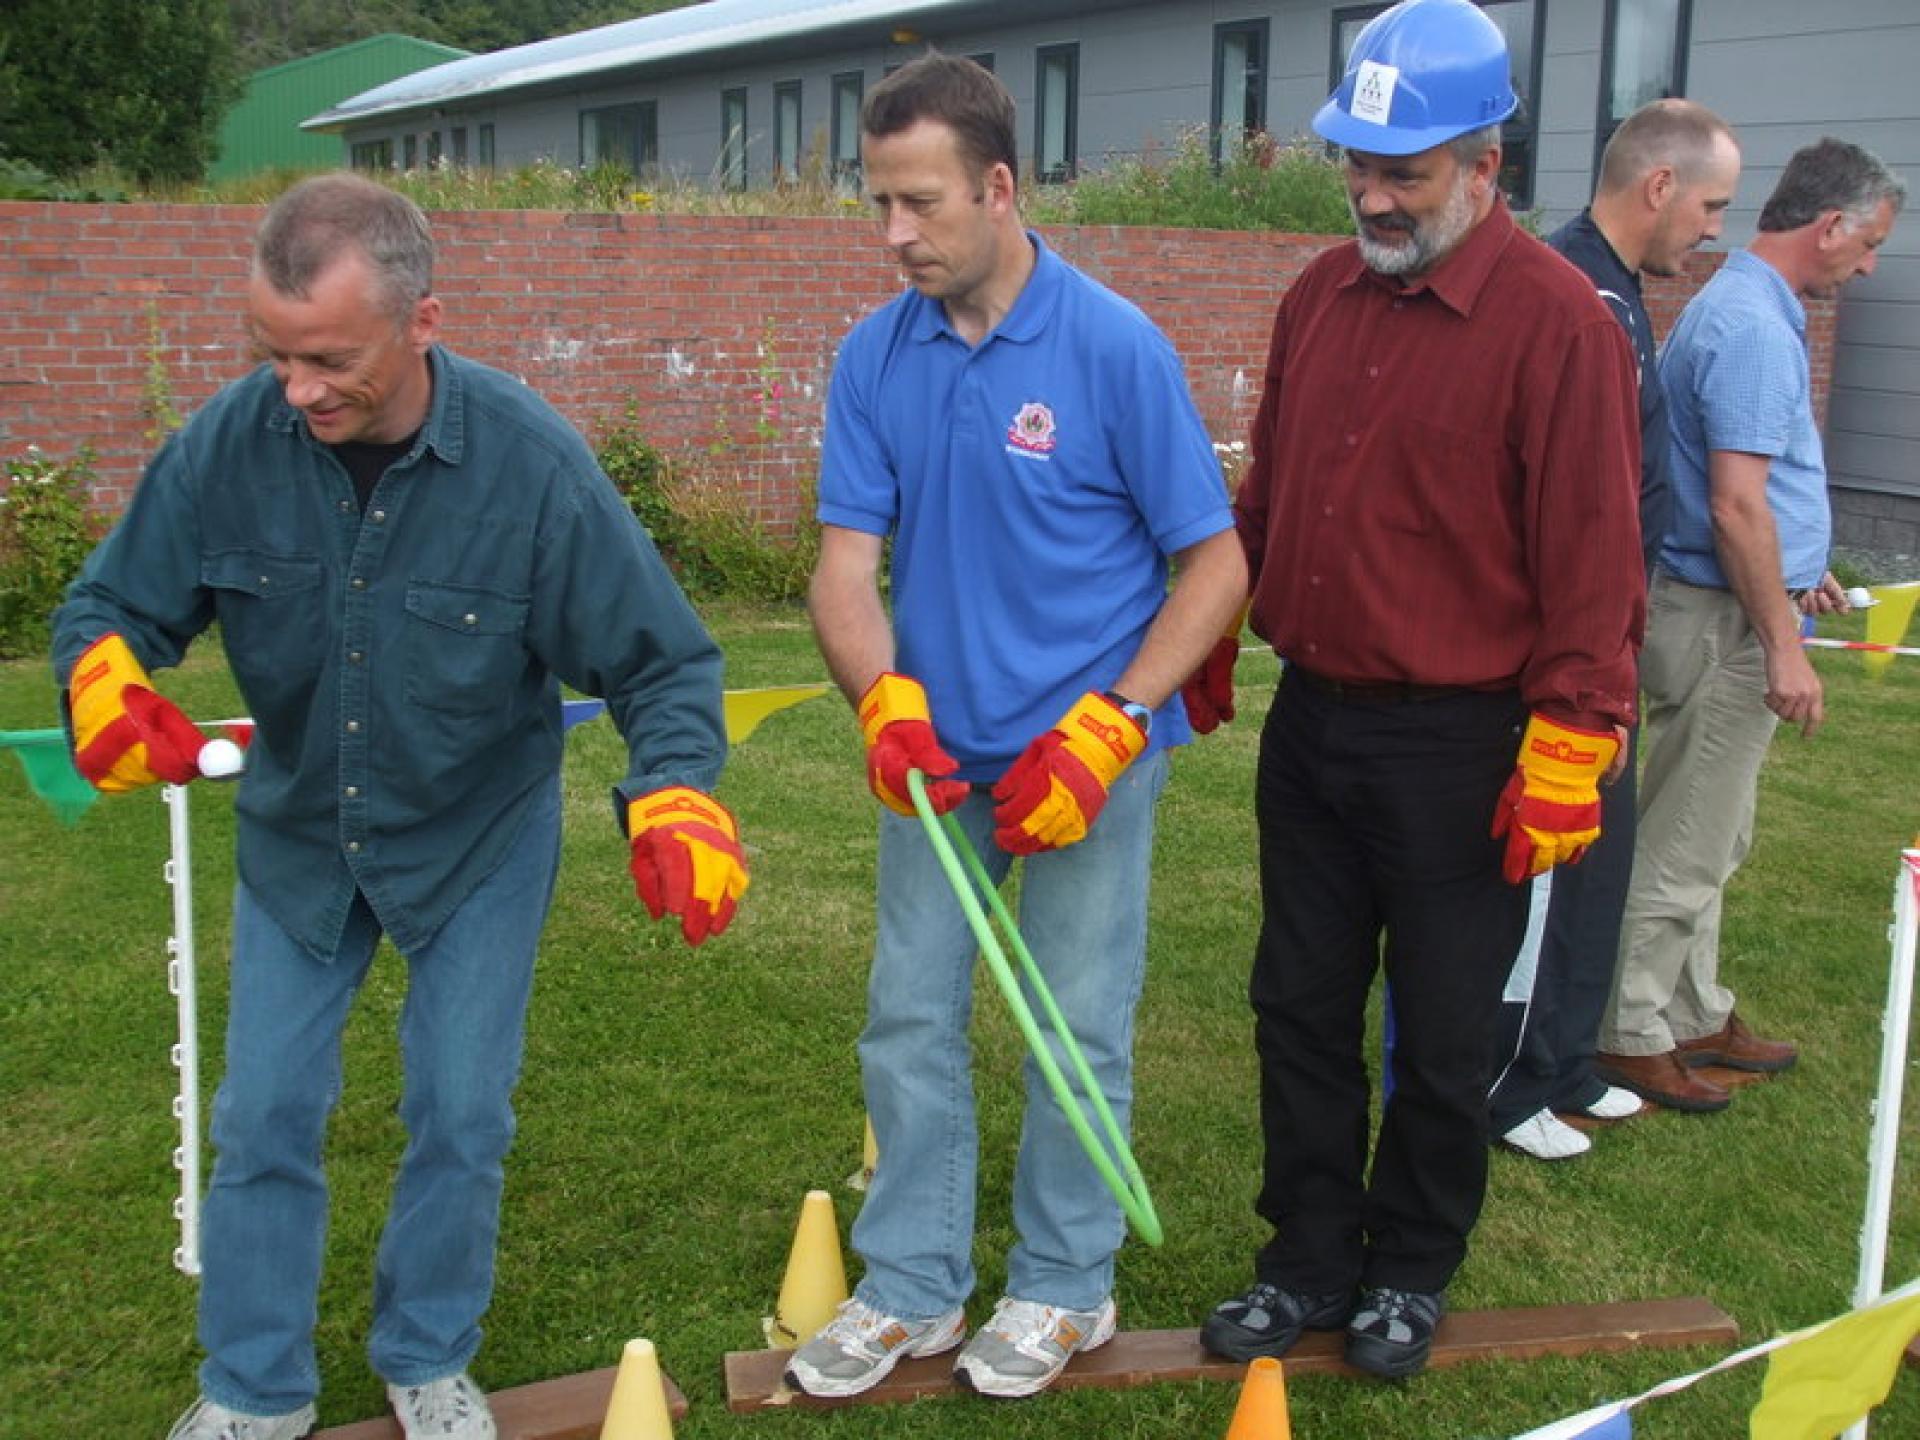 Lews Castle College Team Building Day